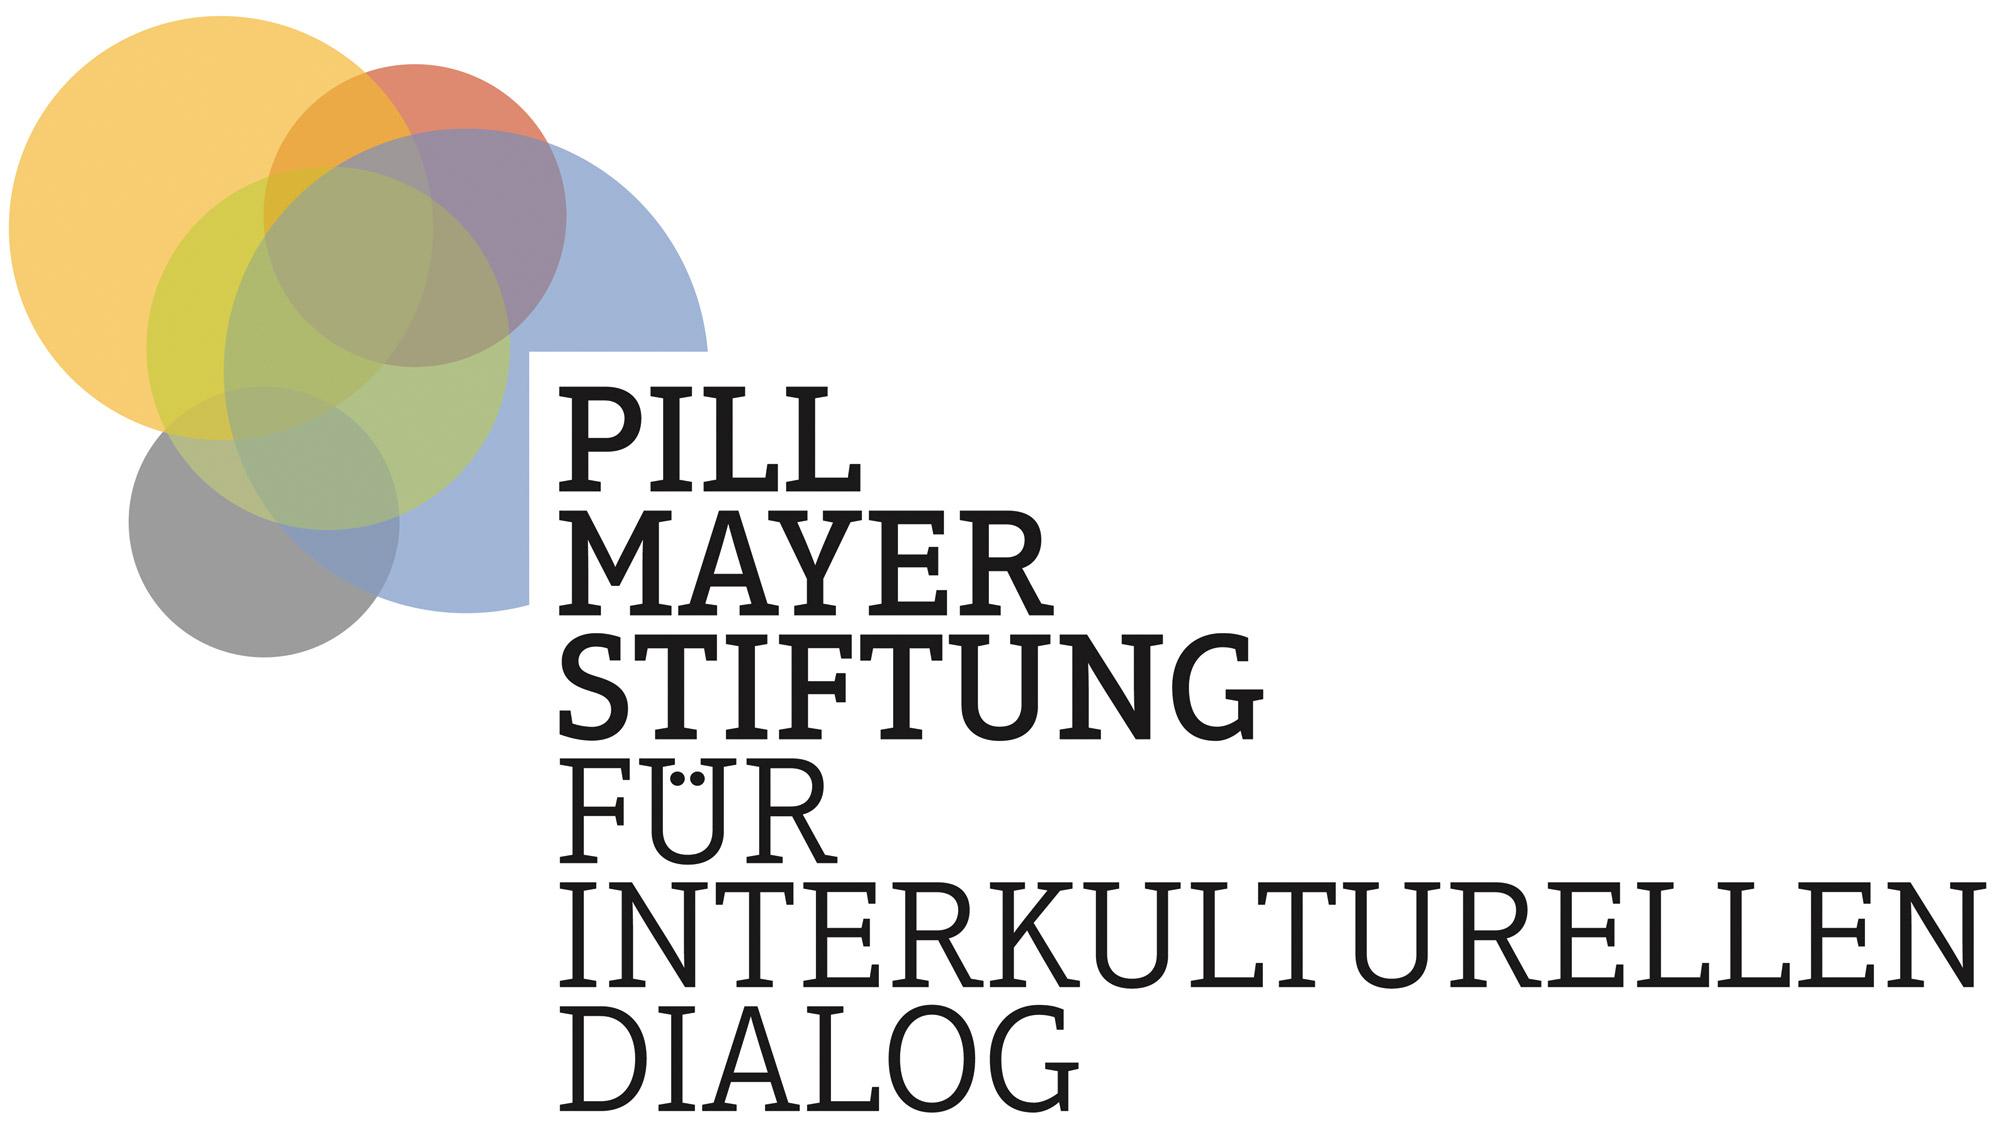 PILL MAYER STIFTUNG FÜR INTERKULTURELLEN DIALOG